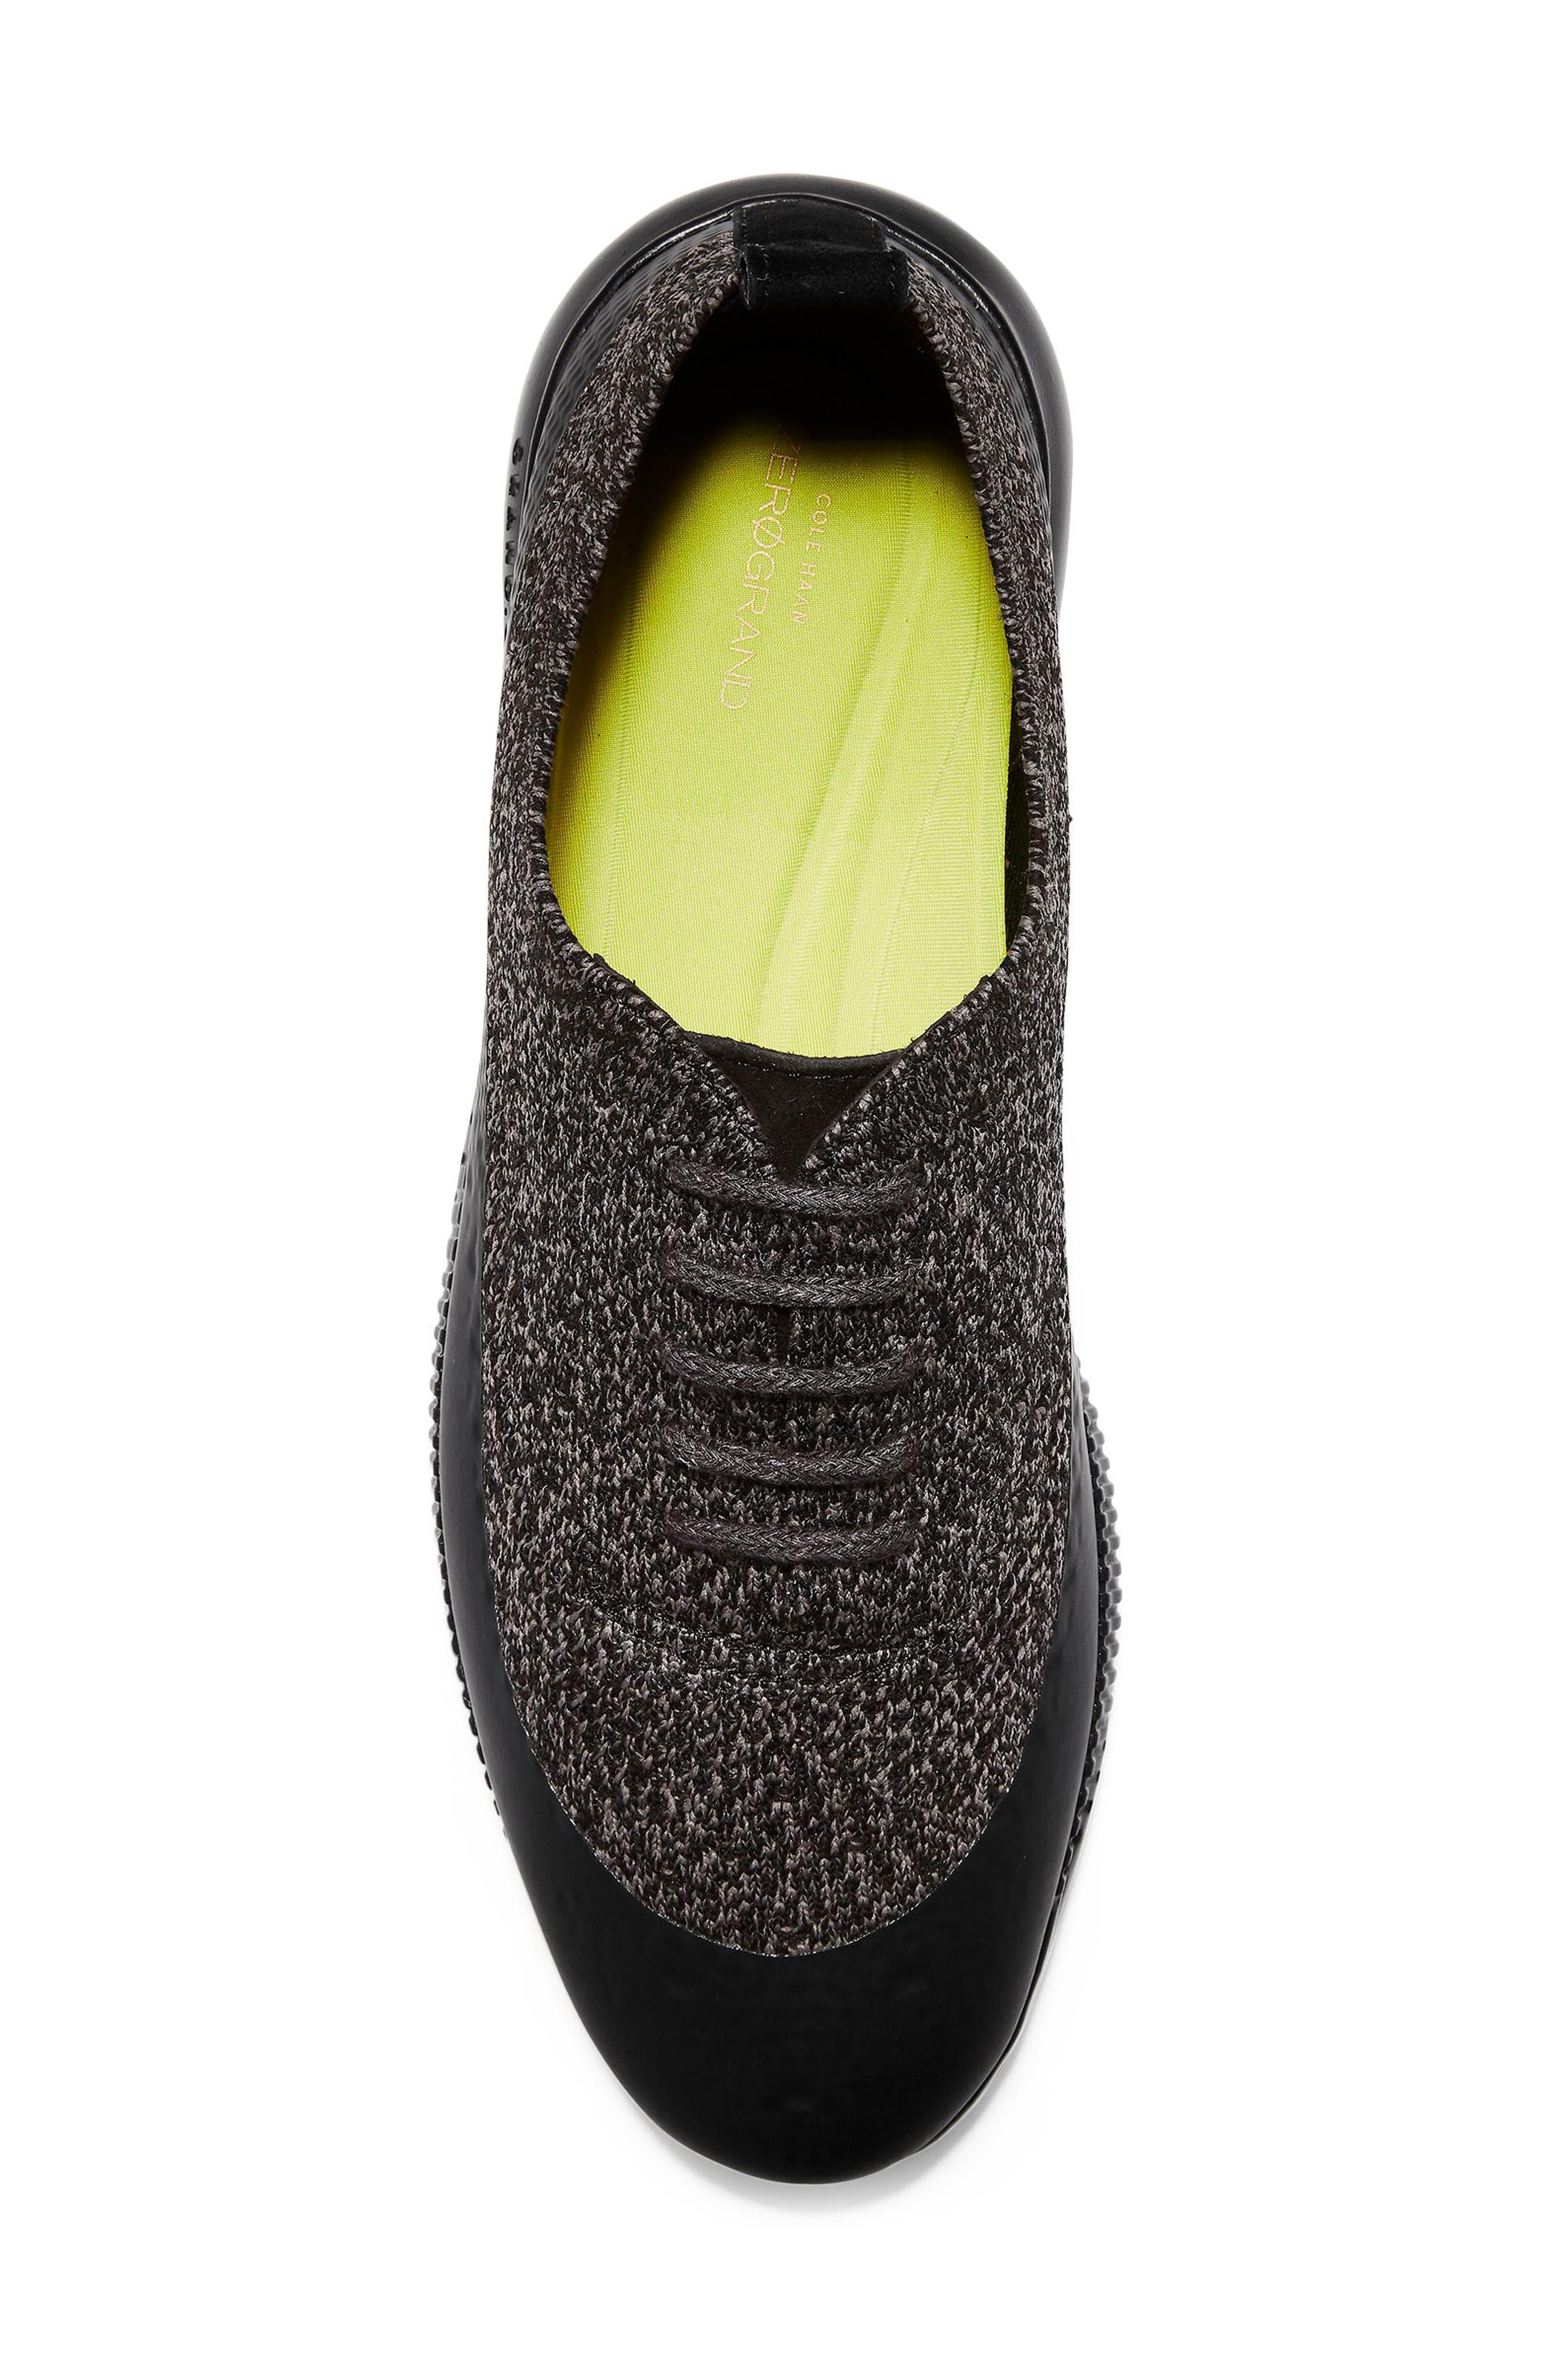 2 Zerogrand Stitchlite Oxford Sneaker,                             Alternate thumbnail 5, color,                             BLACK/ STORM CLOUD KNIT FABRIC